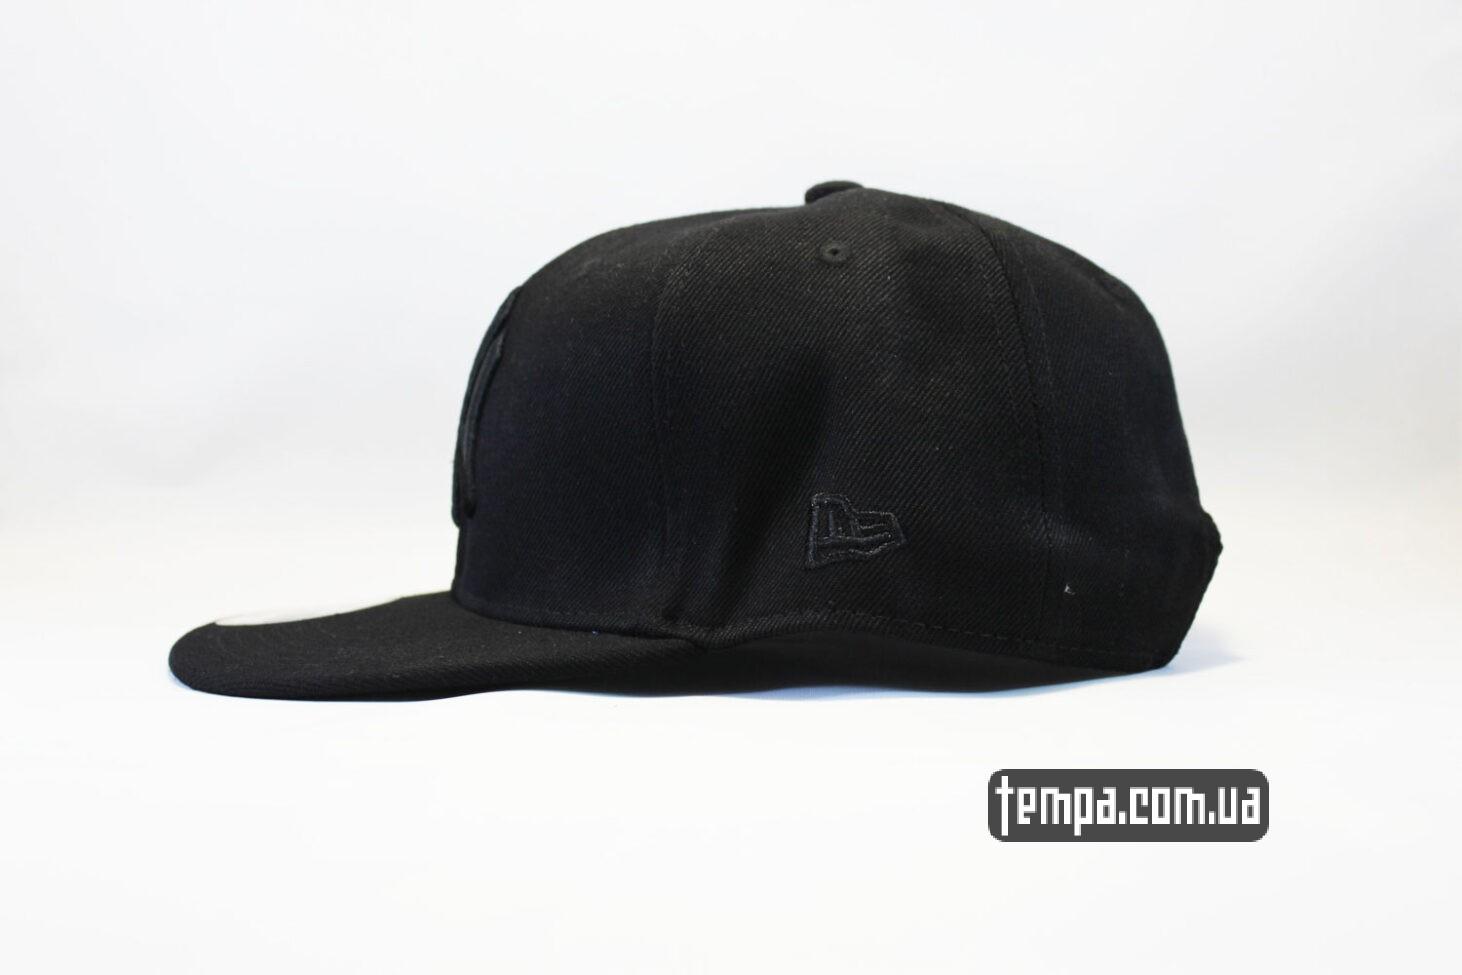 янки янкис кепка Snapback New Era NYC New York черная на черном black